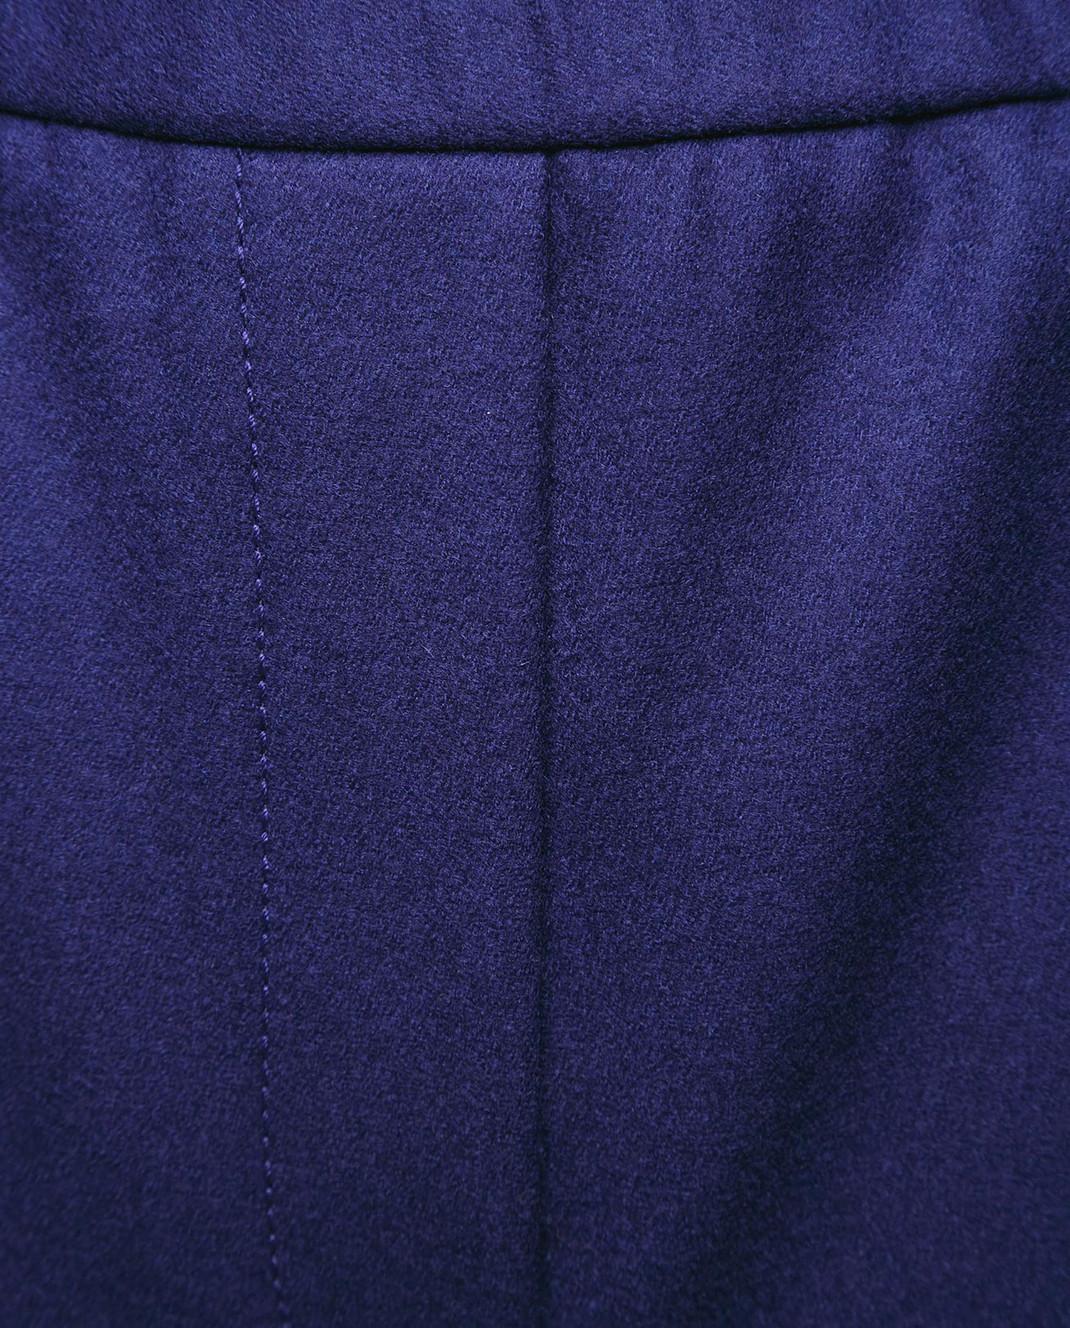 Bottega Veneta Синие брюки 513214 изображение 5